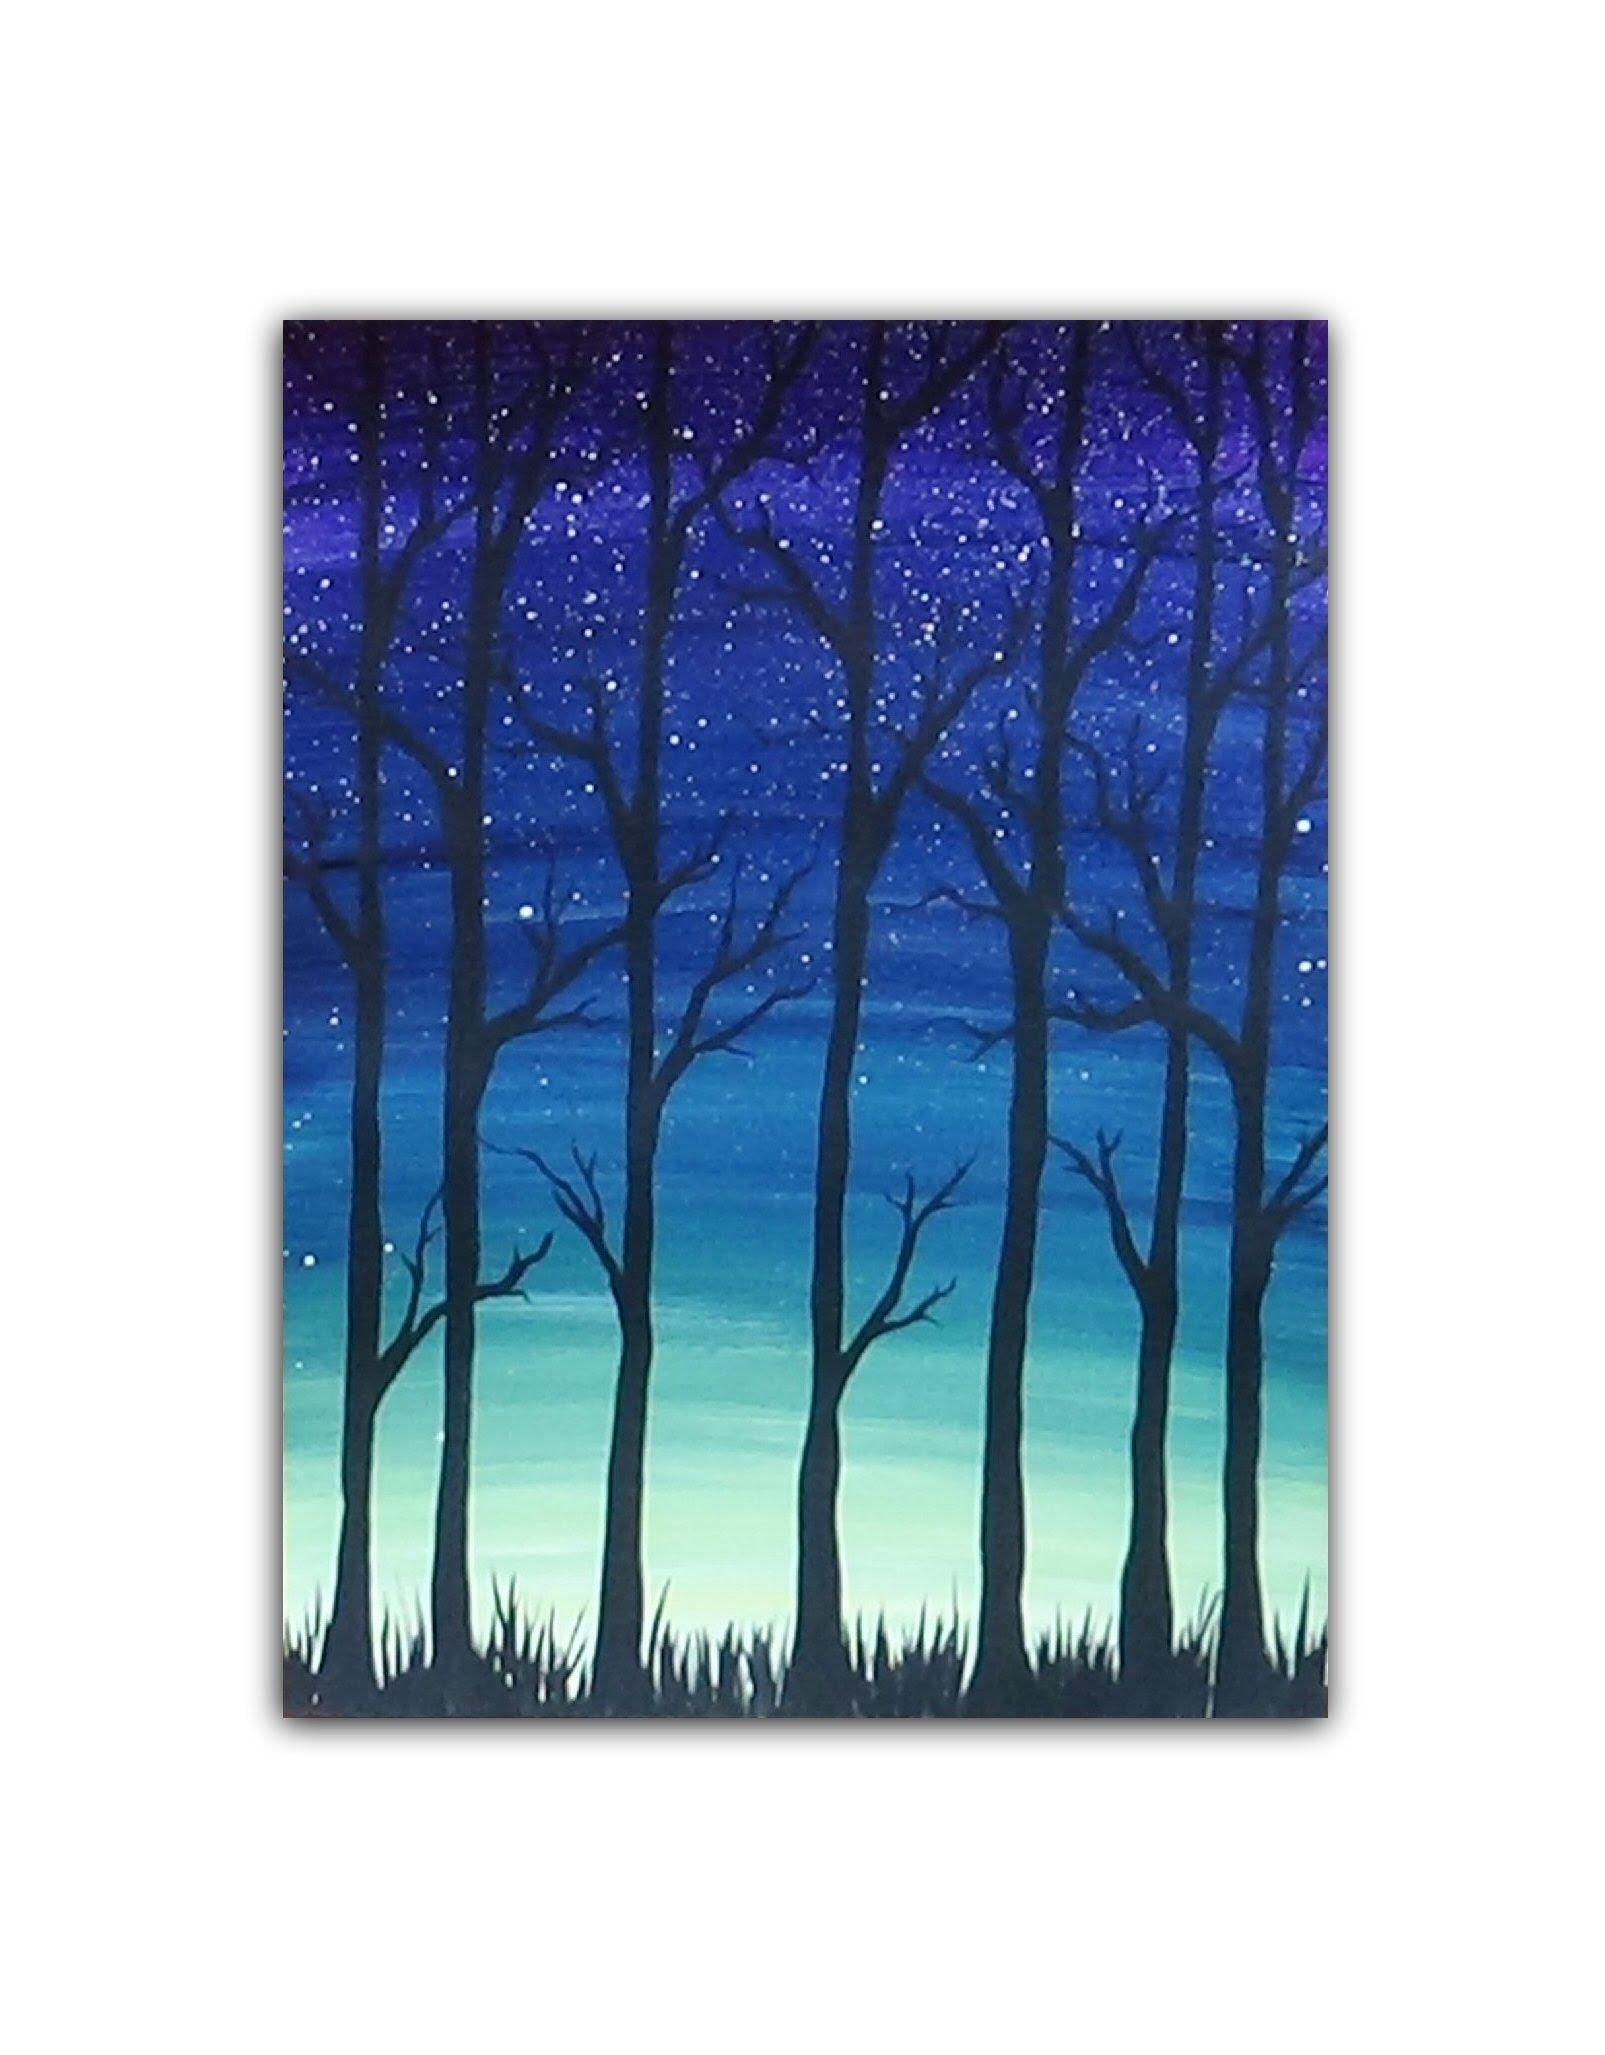 Tree Silhouette Painting : silhouette, painting, Acrylic, Painting, Simple, Trees, Silhouette, Painting,